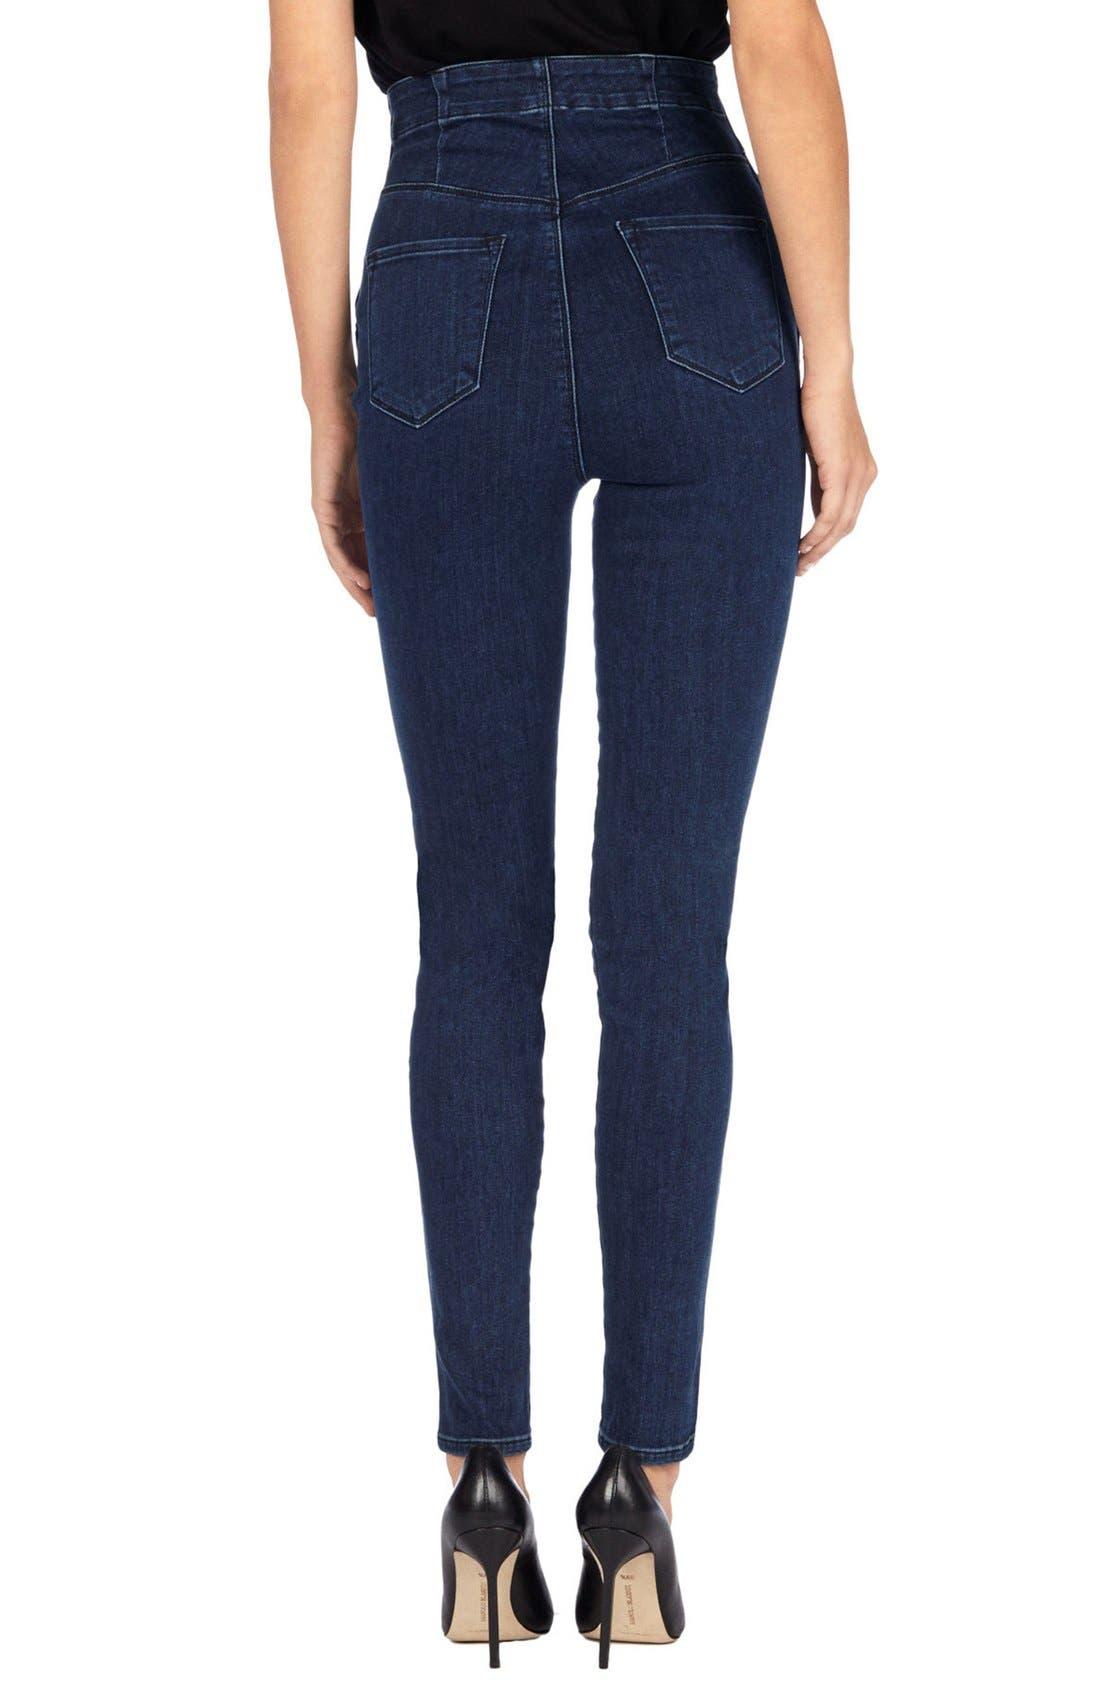 'Natasha Sky High' High Rise Skinny Jeans,                             Alternate thumbnail 4, color,                             410